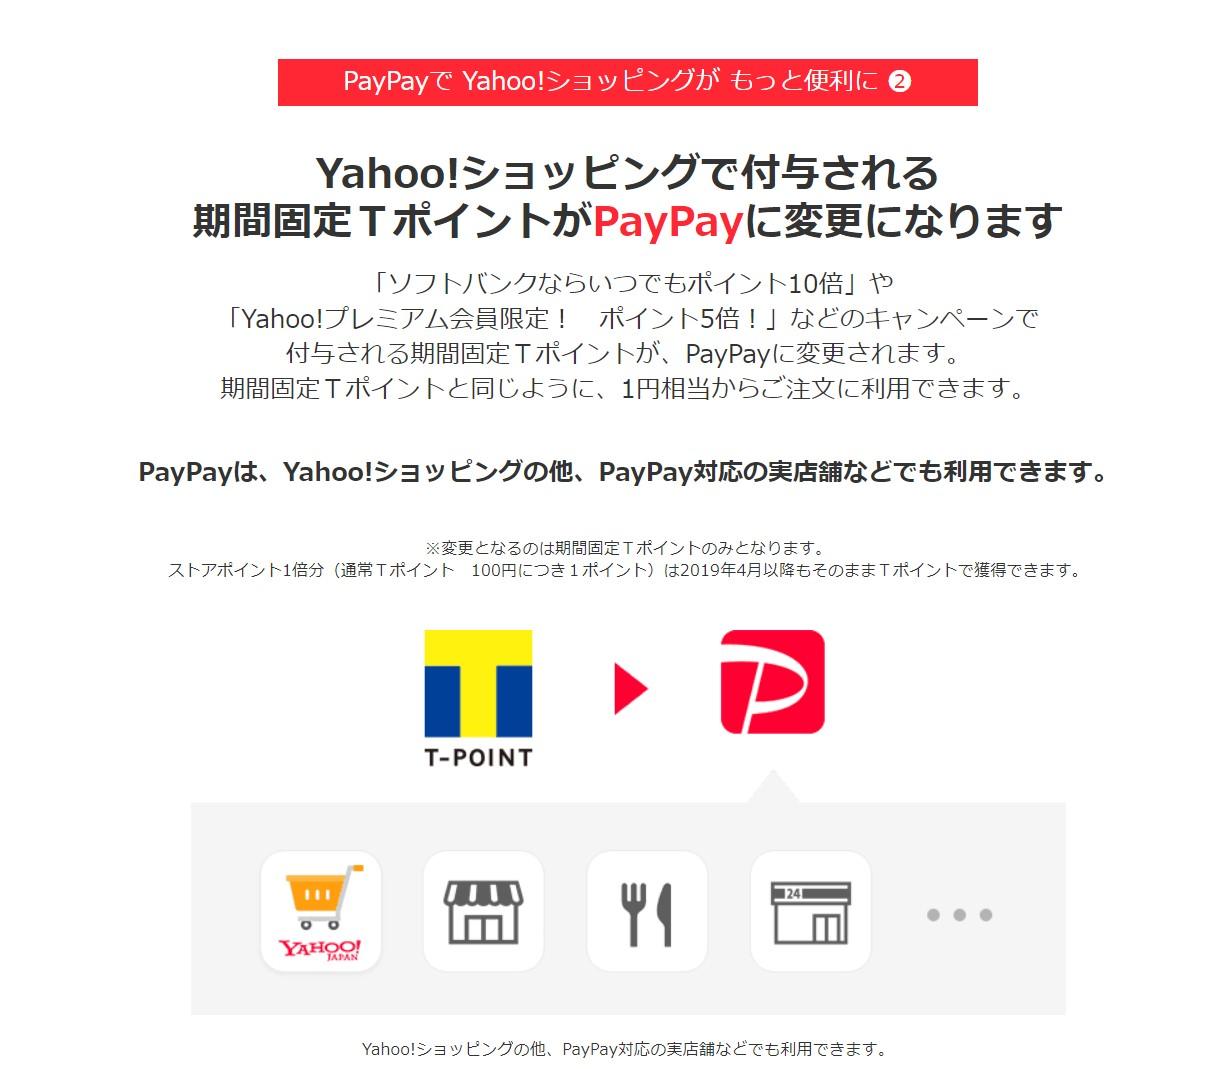 PayPay-YahooJ